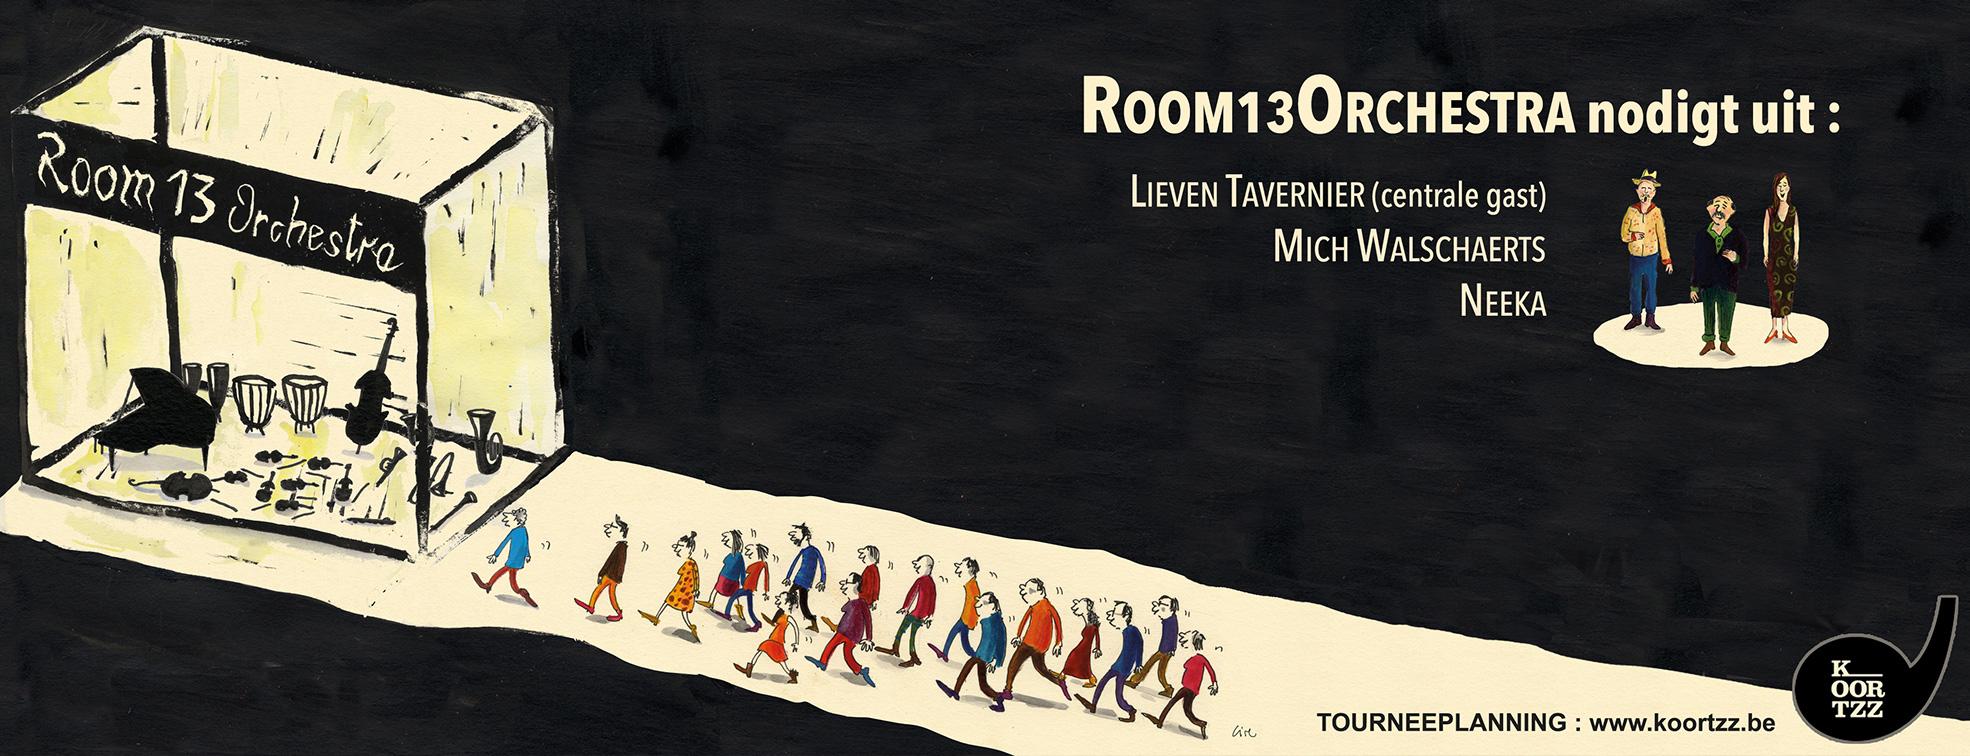 Room13orchestra optredens concerten